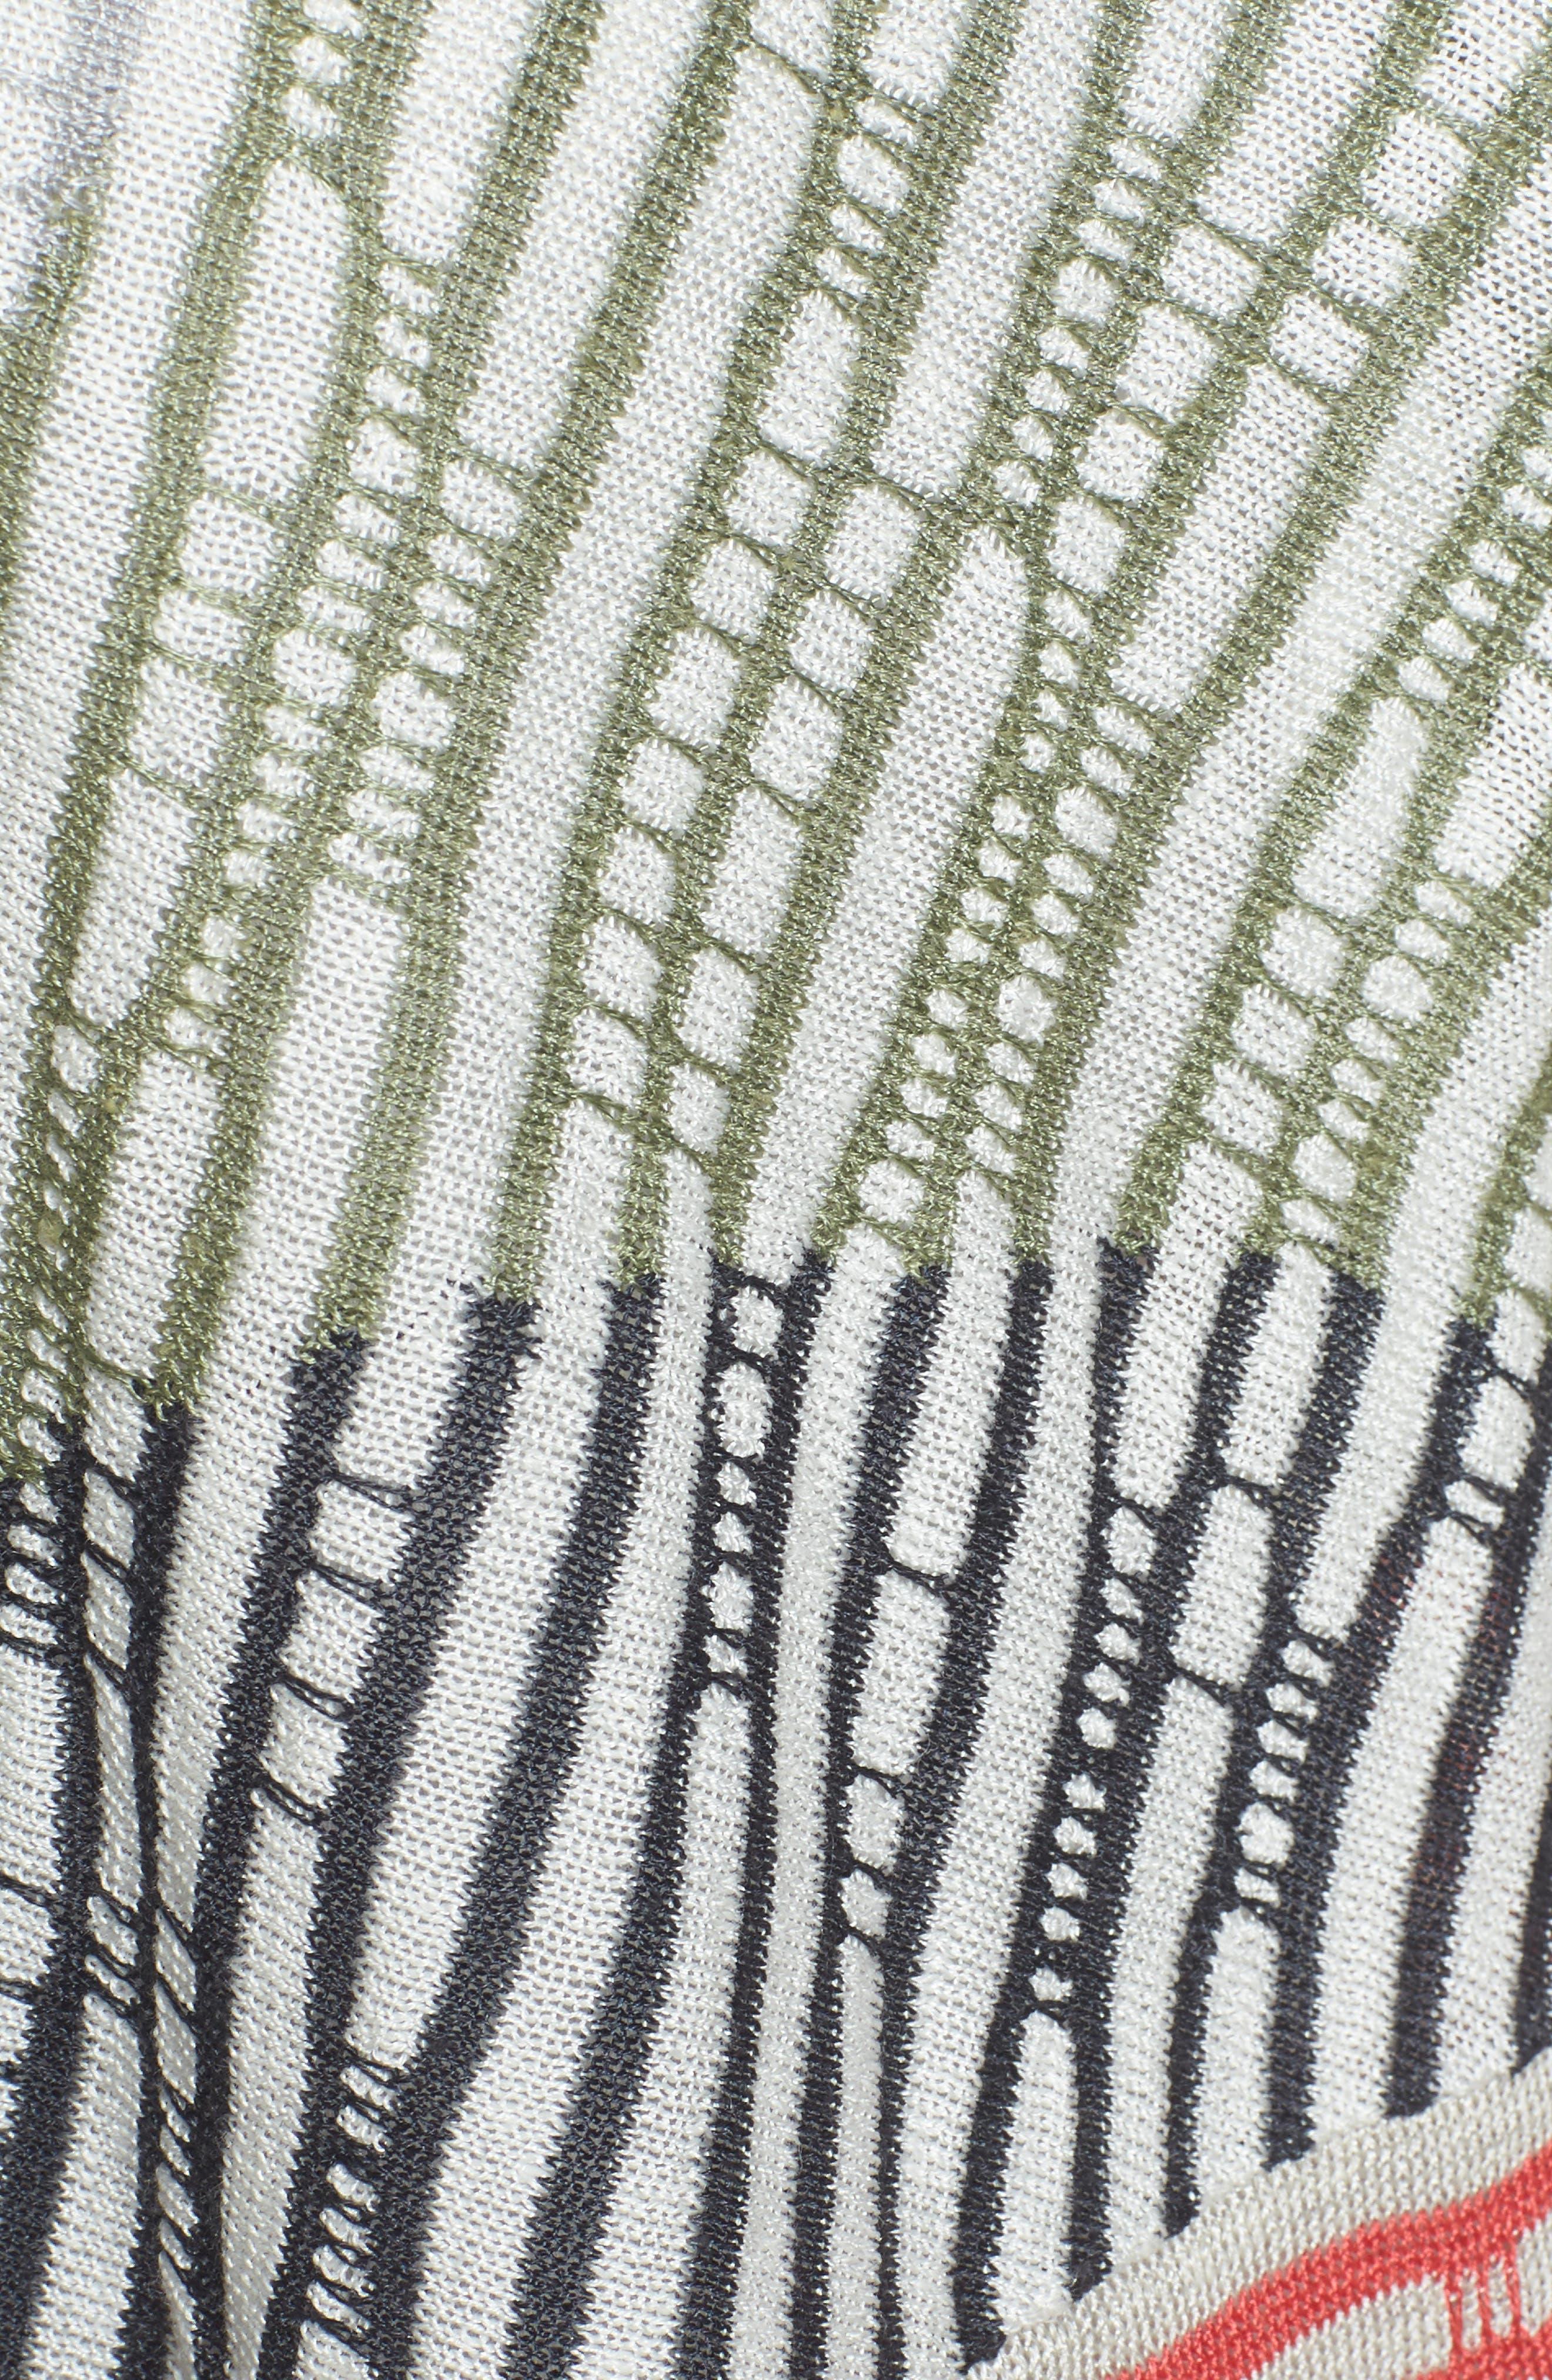 Stitch Blocked 4-Way Cardigan,                             Alternate thumbnail 5, color,                             490